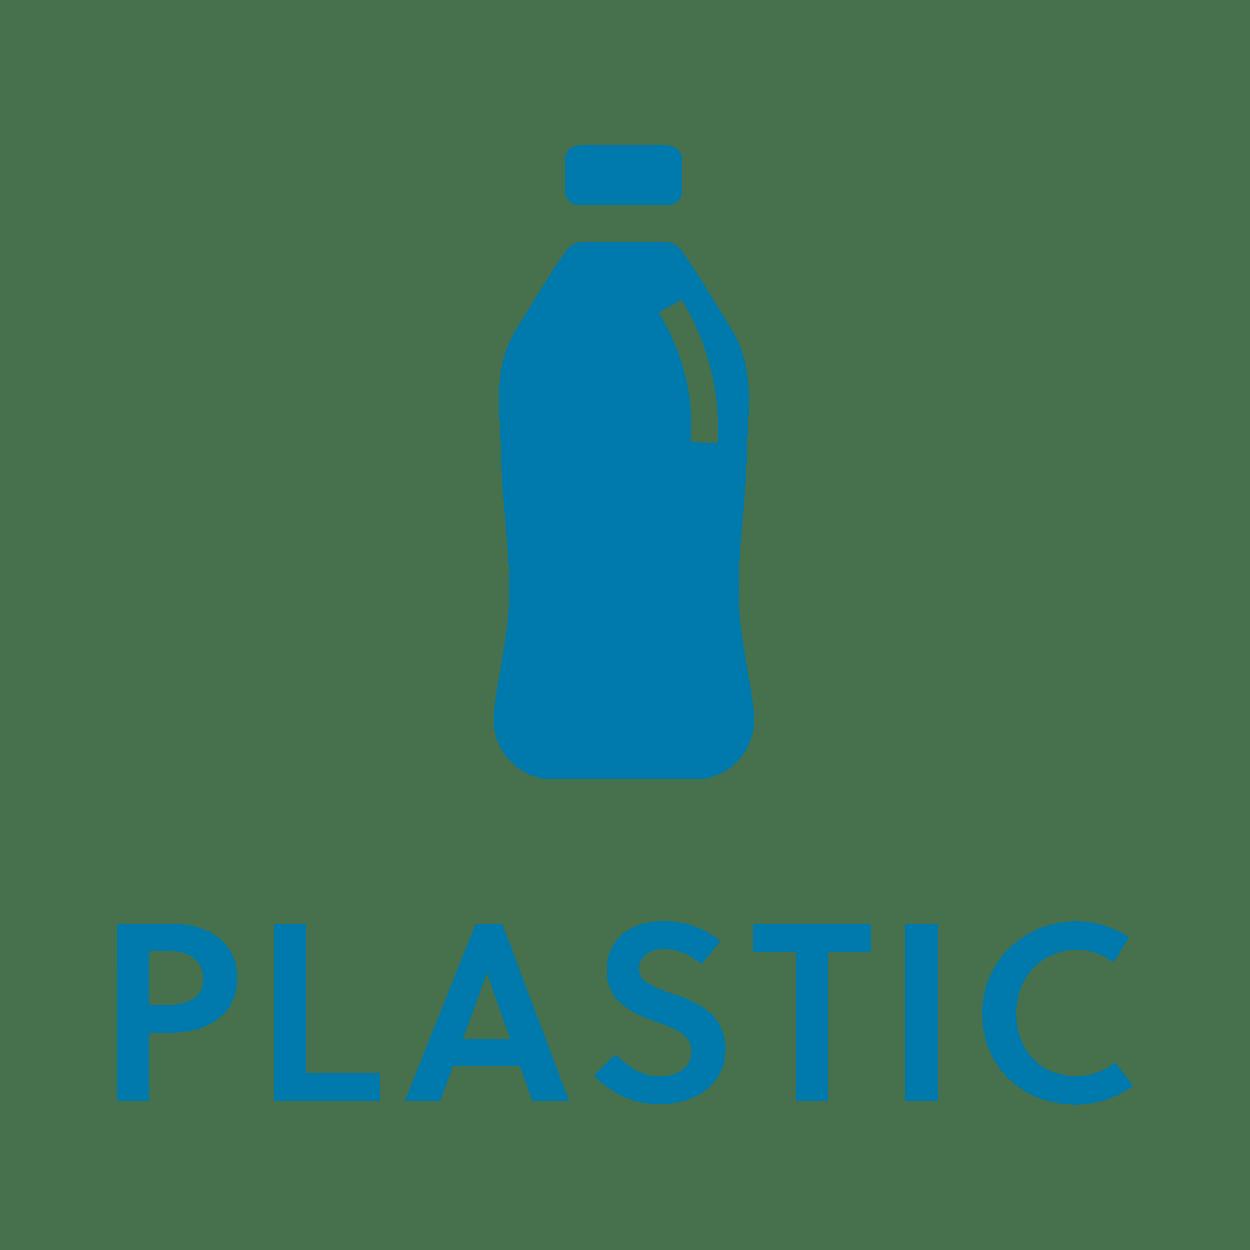 impact_solutions_plasticicon-01